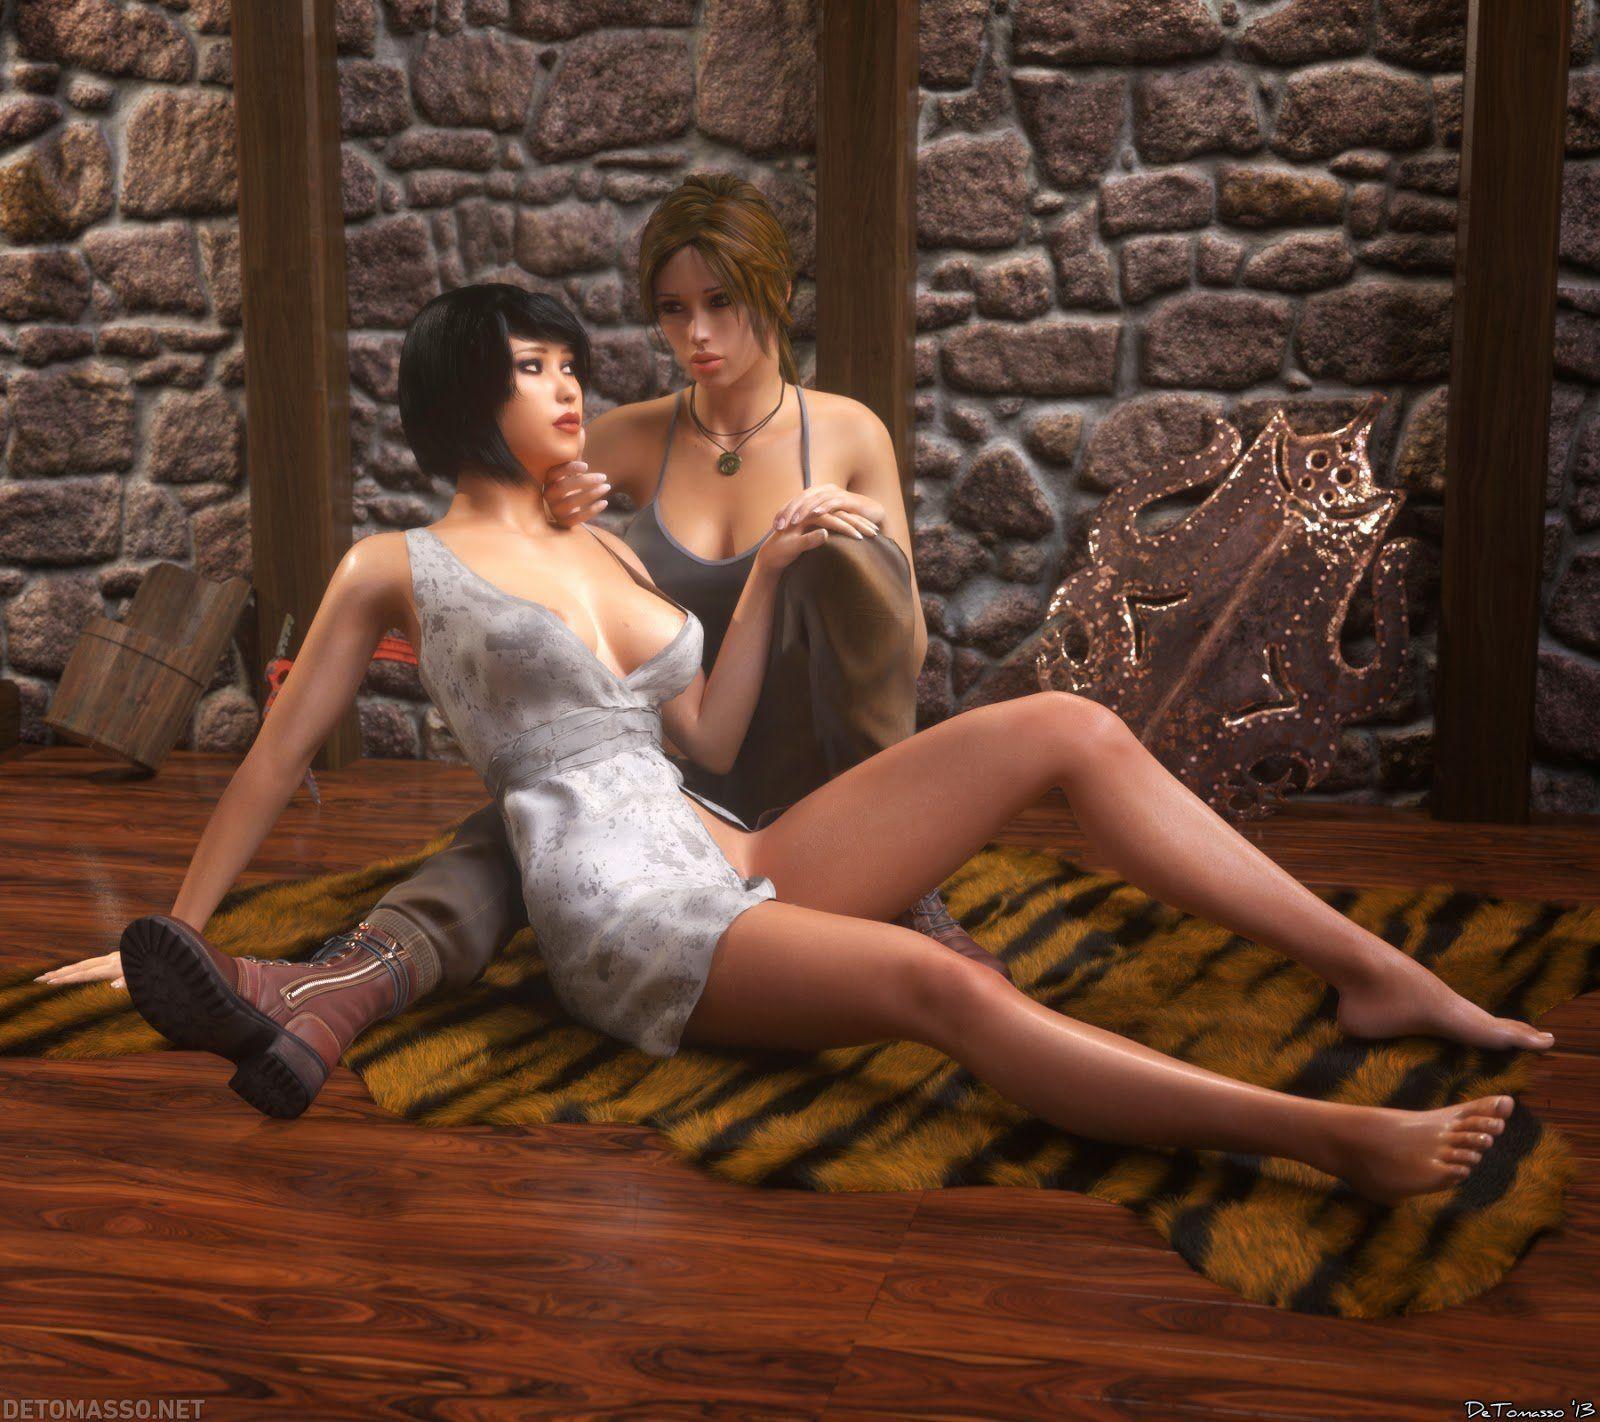 hentaihome.net-Tomb-Raider-porno-3D-2